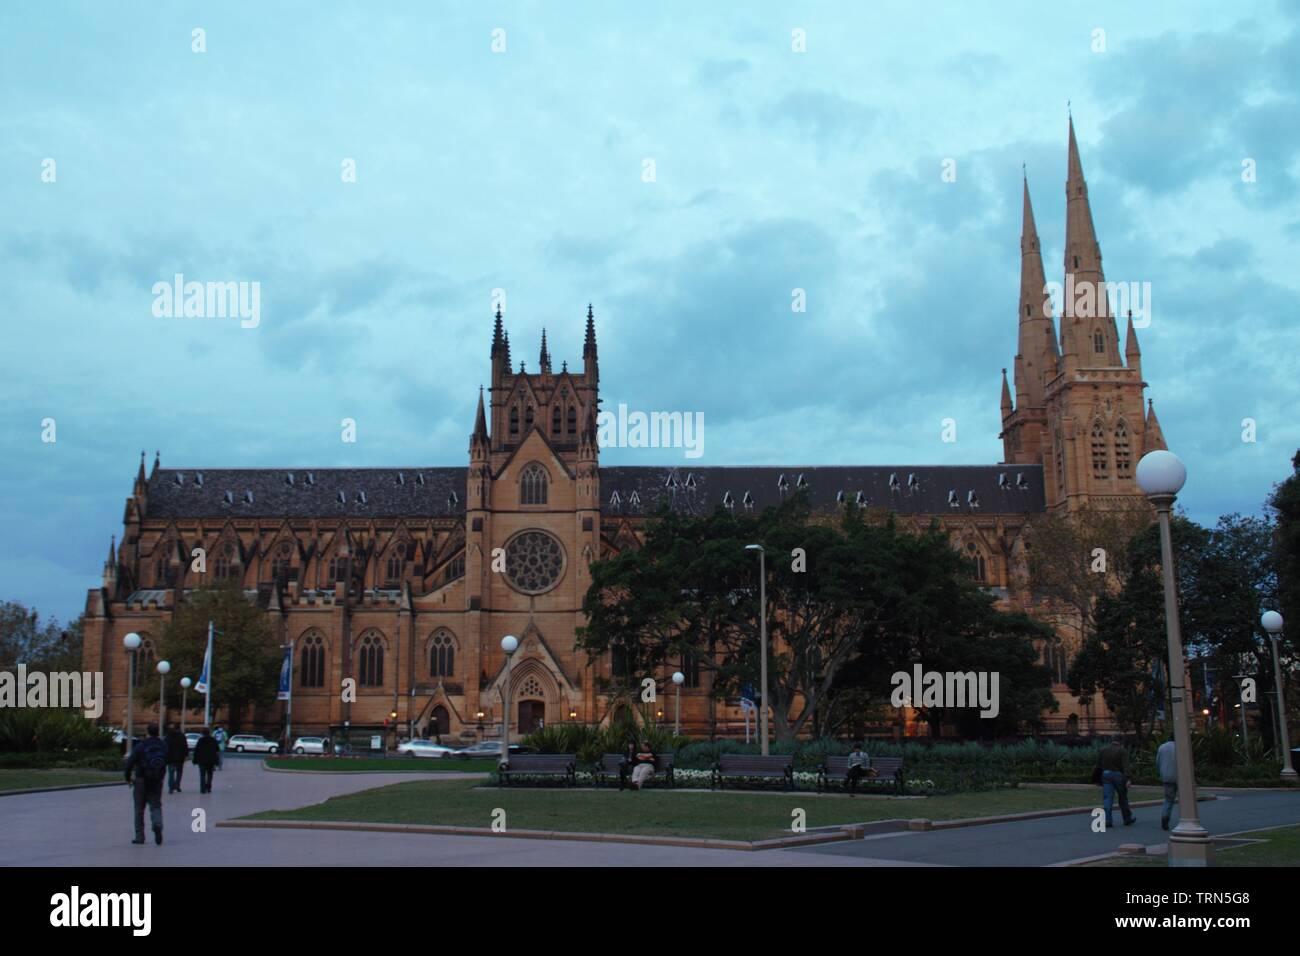 Historical huge church in Sydney Australia - Stock Image